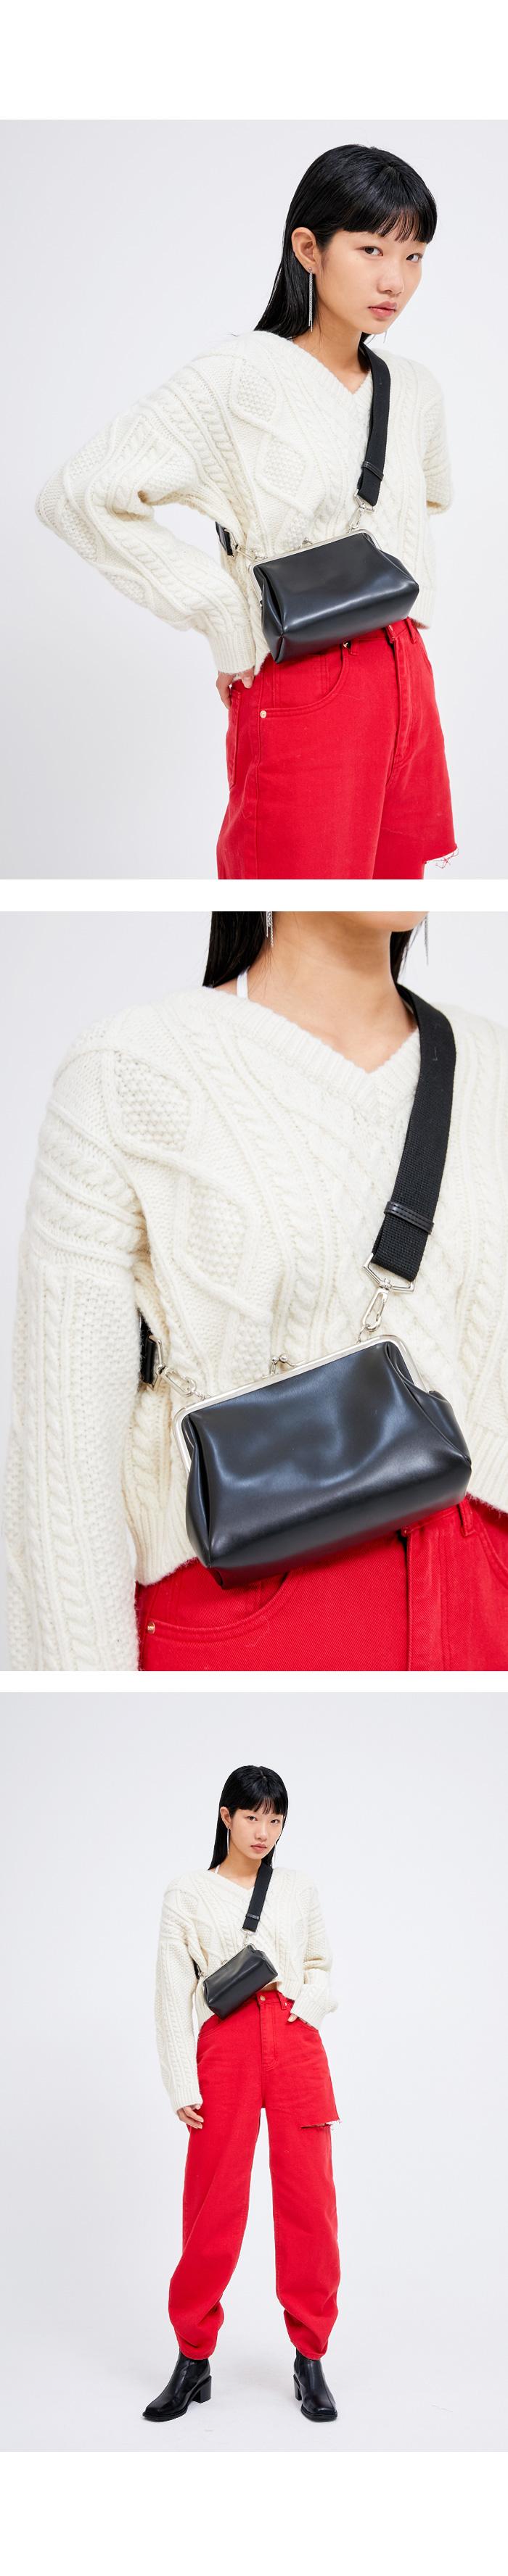 leather clutch cross bag